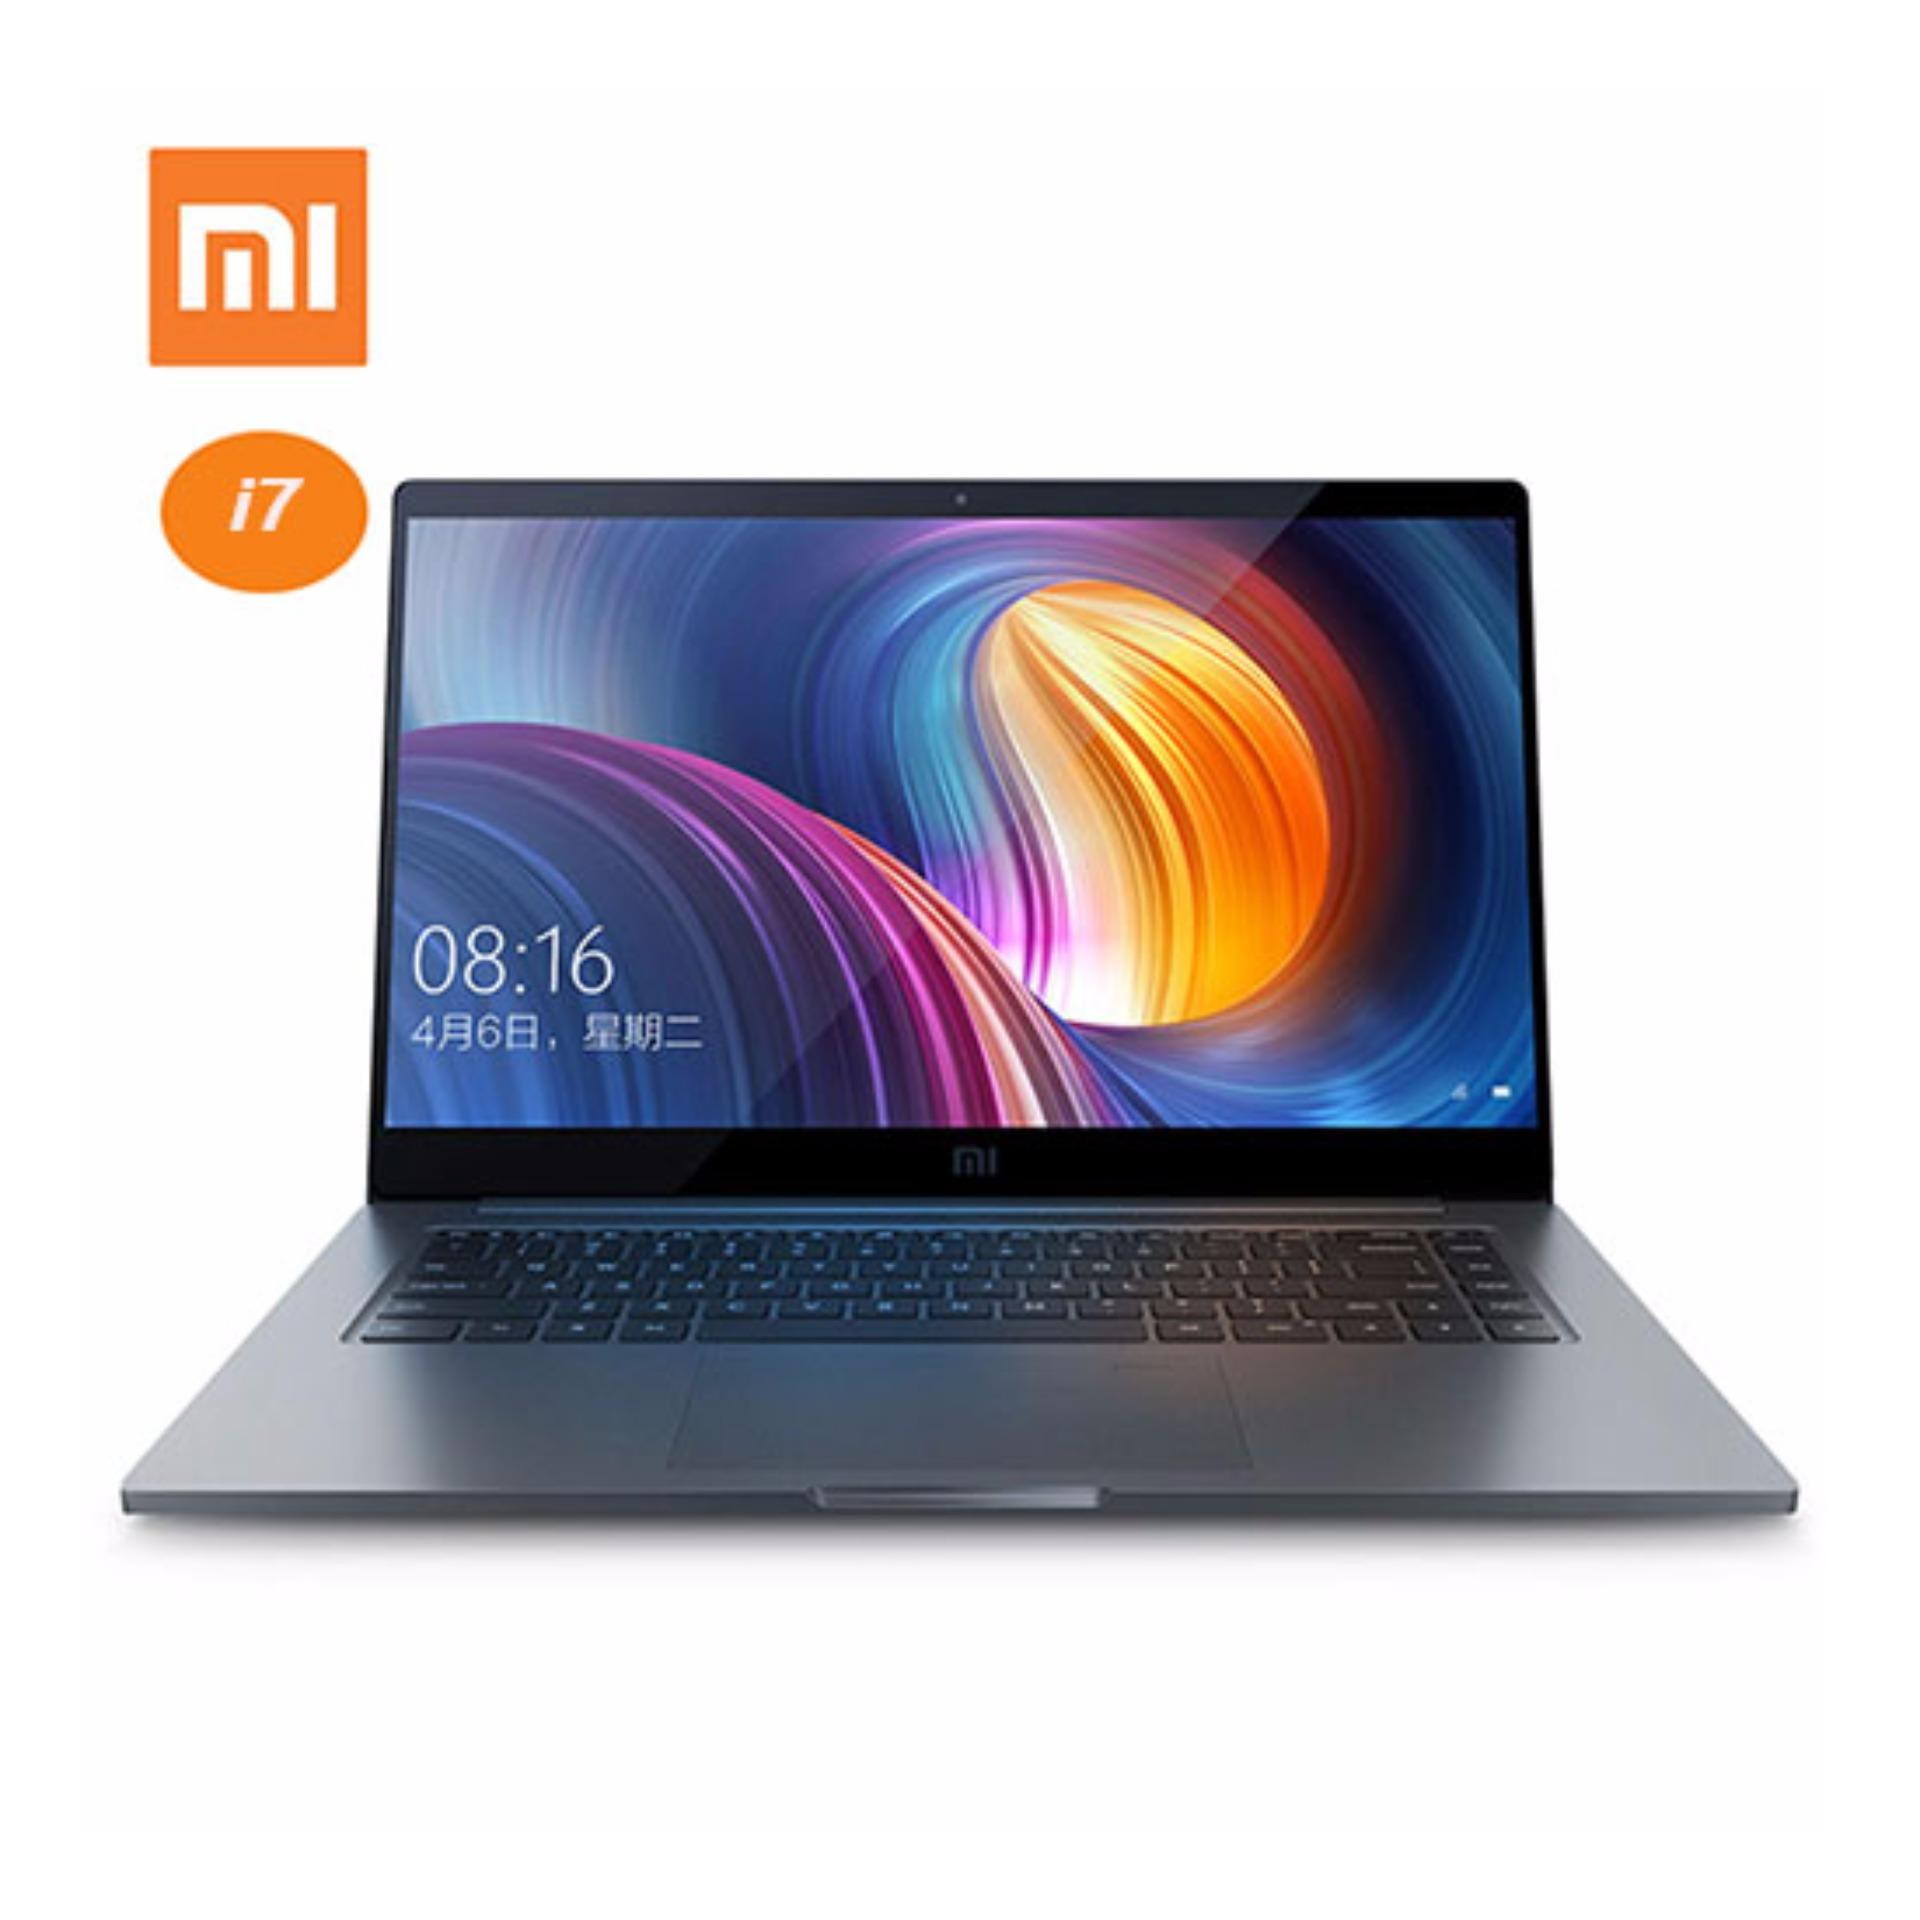 Xiaomi Mi Laptop Air Pro 15.6 Inch Notebook Computer i7-8550U CPU 16GB RAM 256GB SSD GDDR5 Fingerprint Windows 10 (Export)